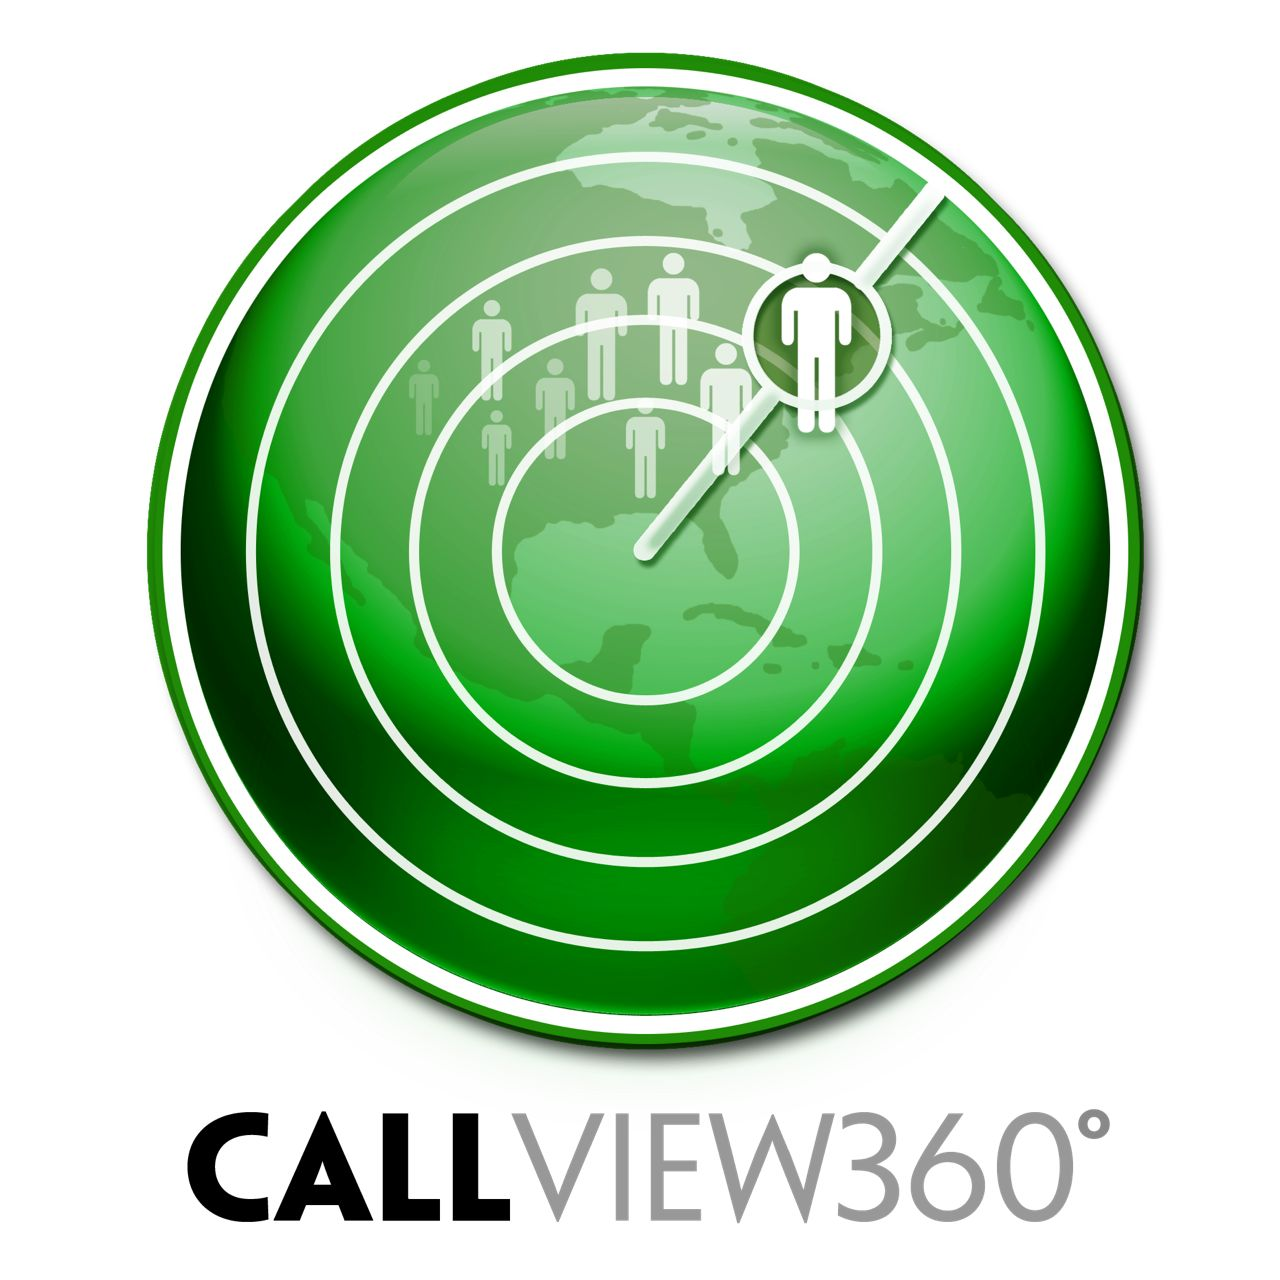 CallView360